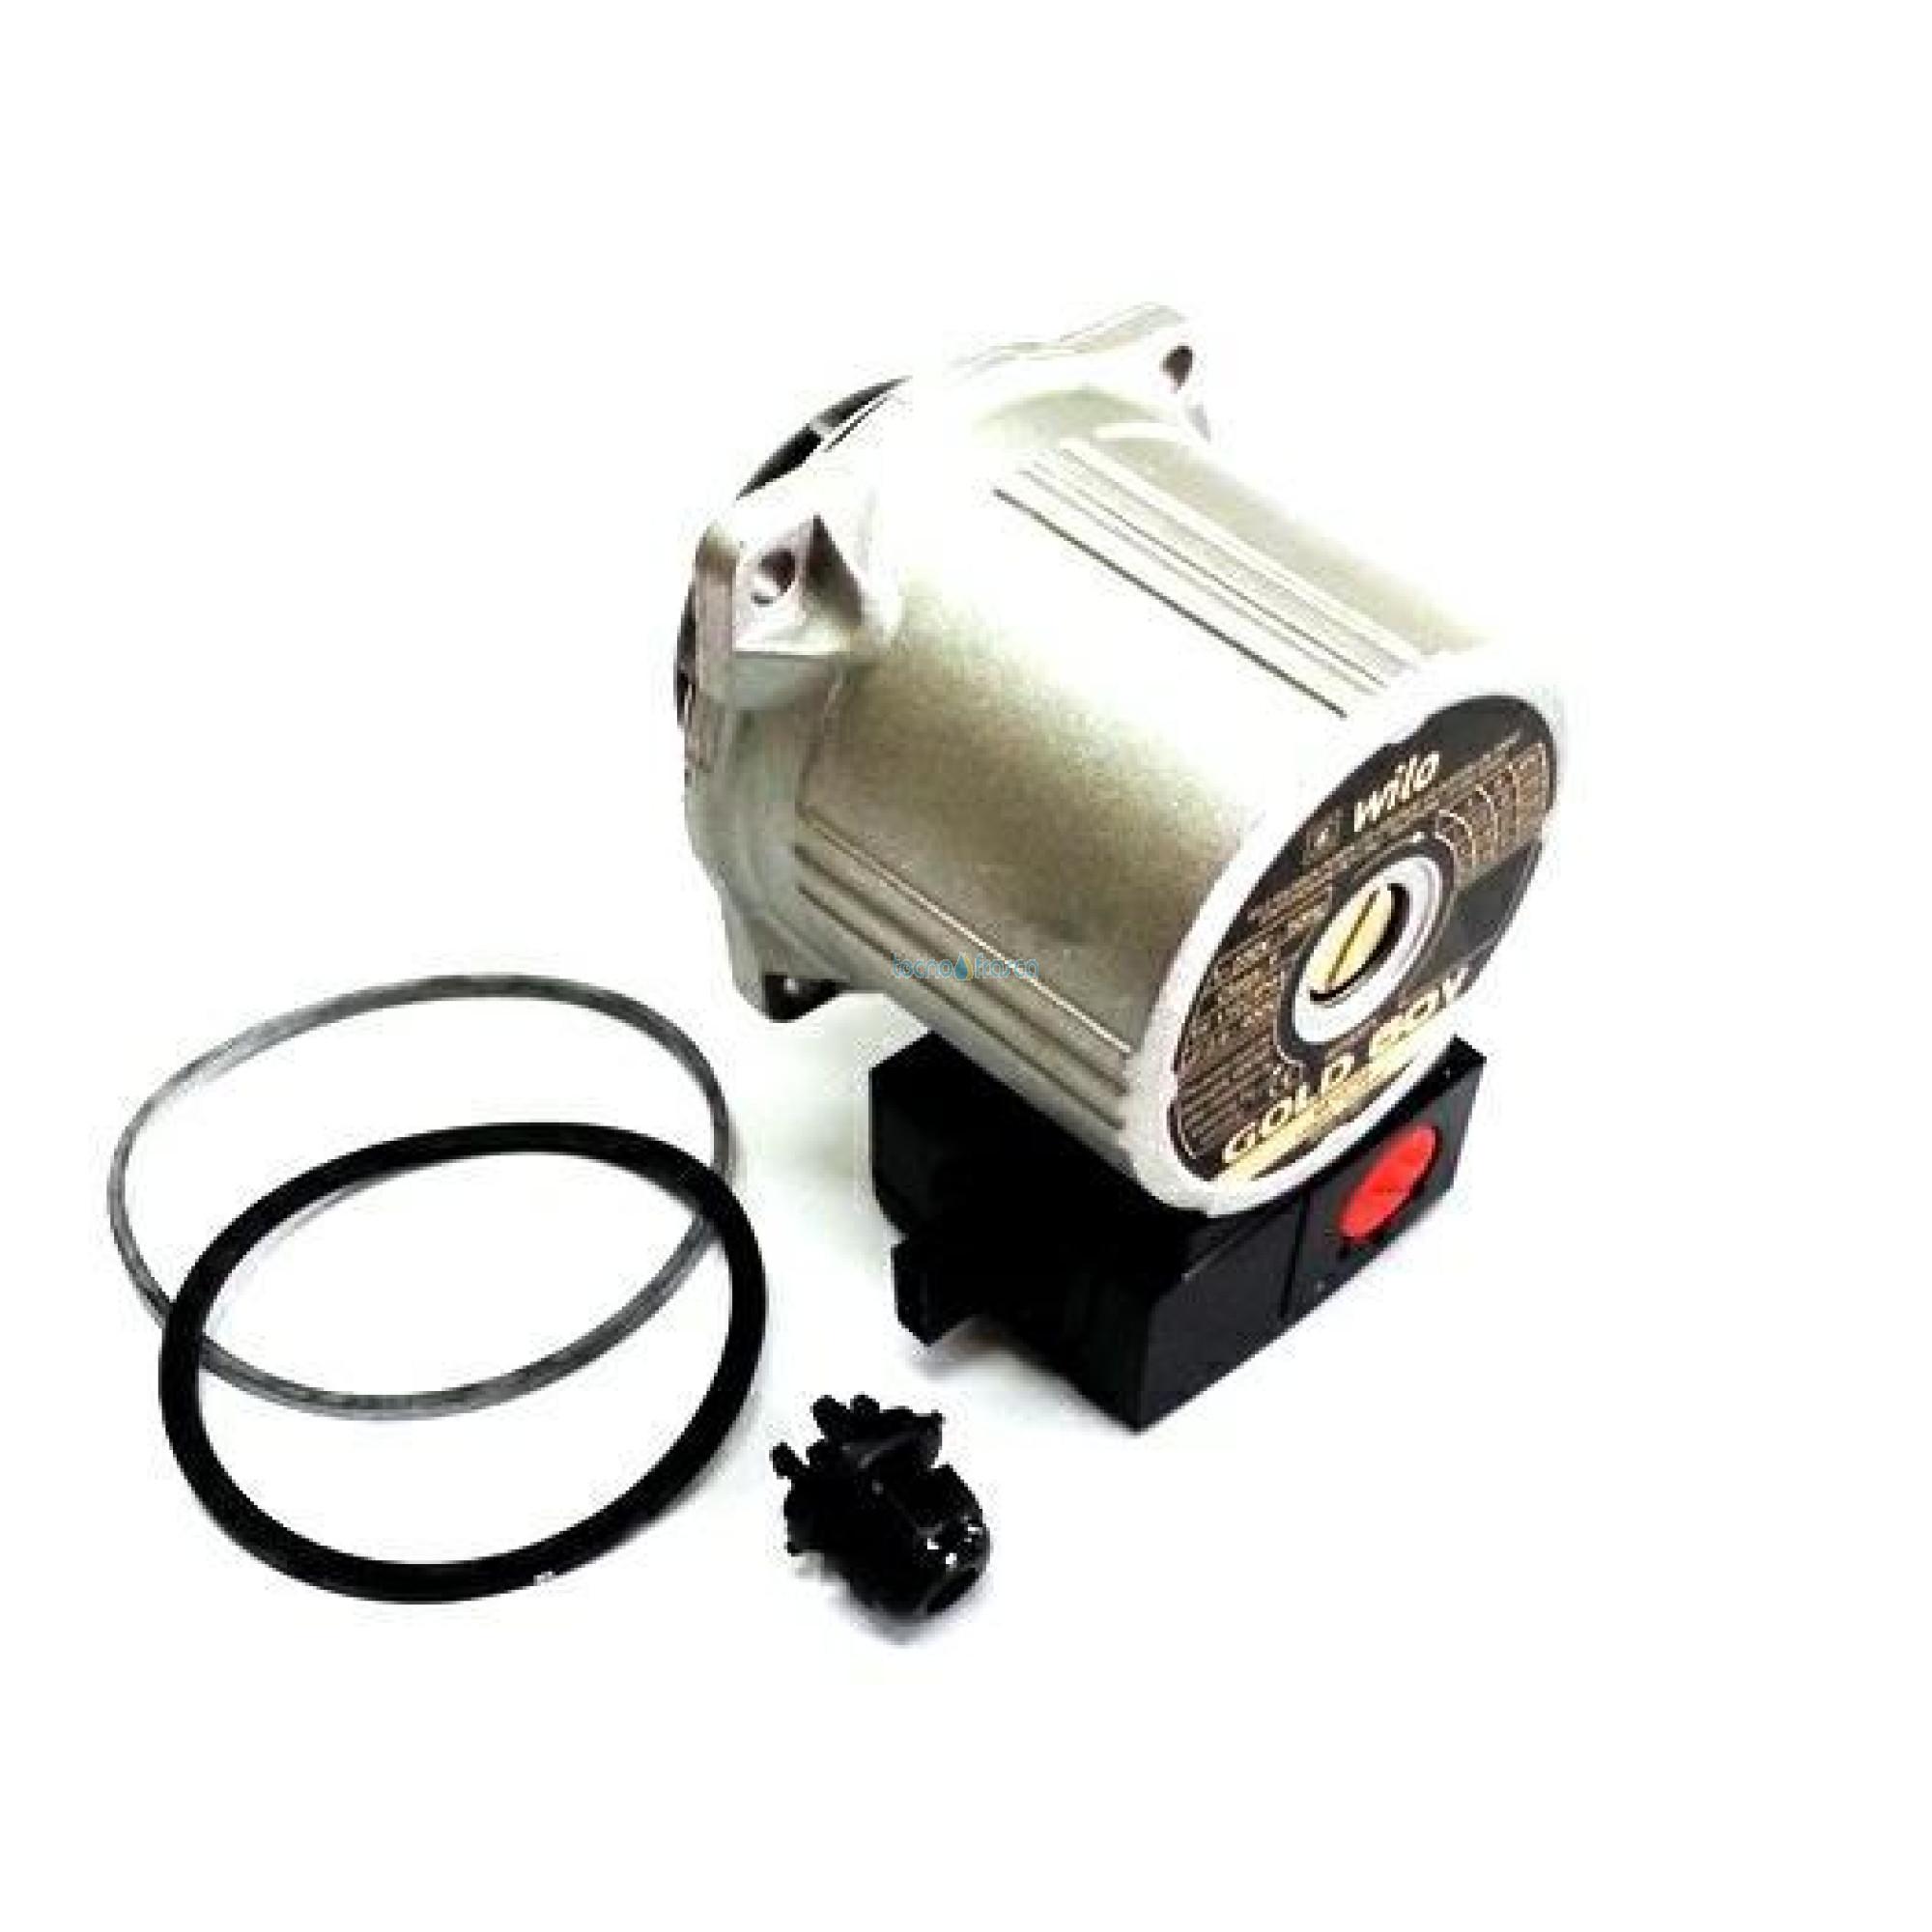 Ariston pompa solo motore kit 996615